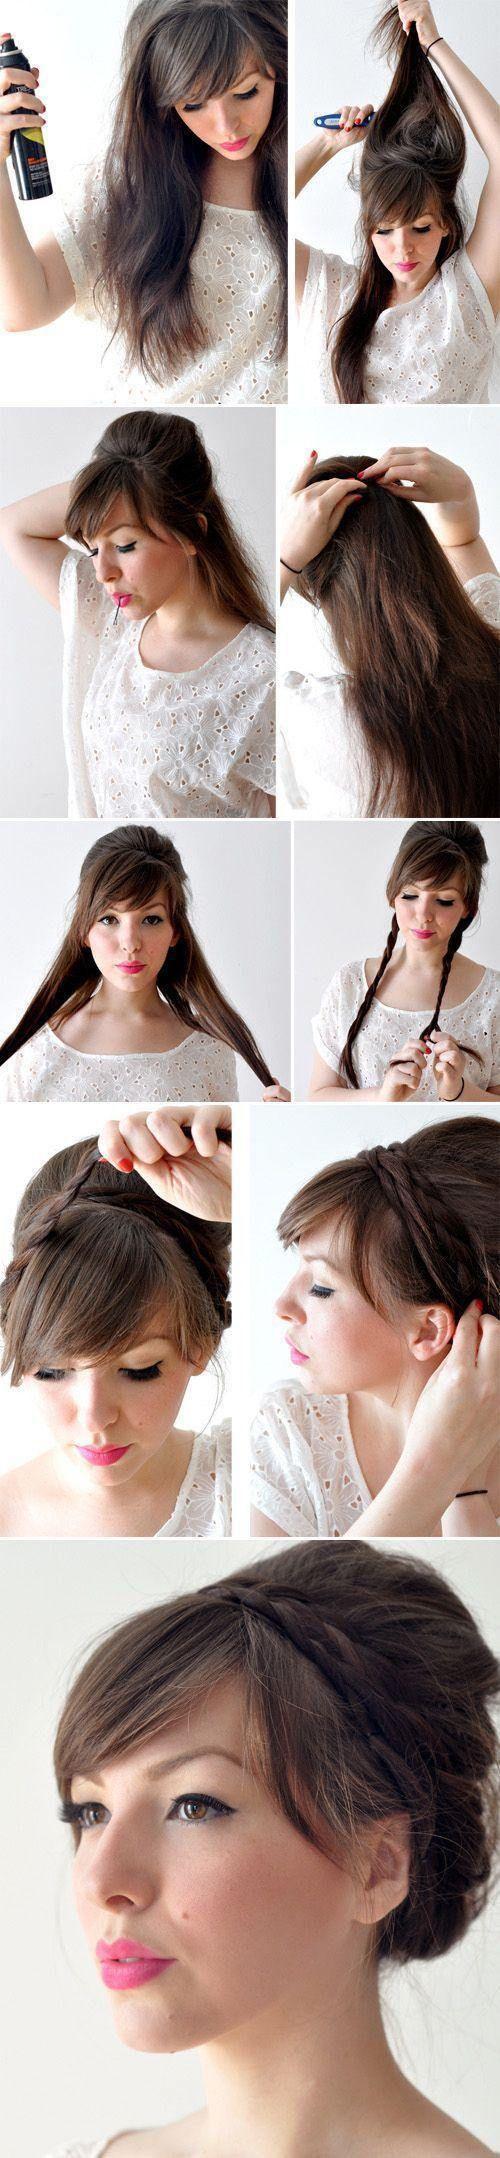 Astounding 1000 Ideas About Lazy Day Hairstyles On Pinterest Full Ponytail Short Hairstyles Gunalazisus